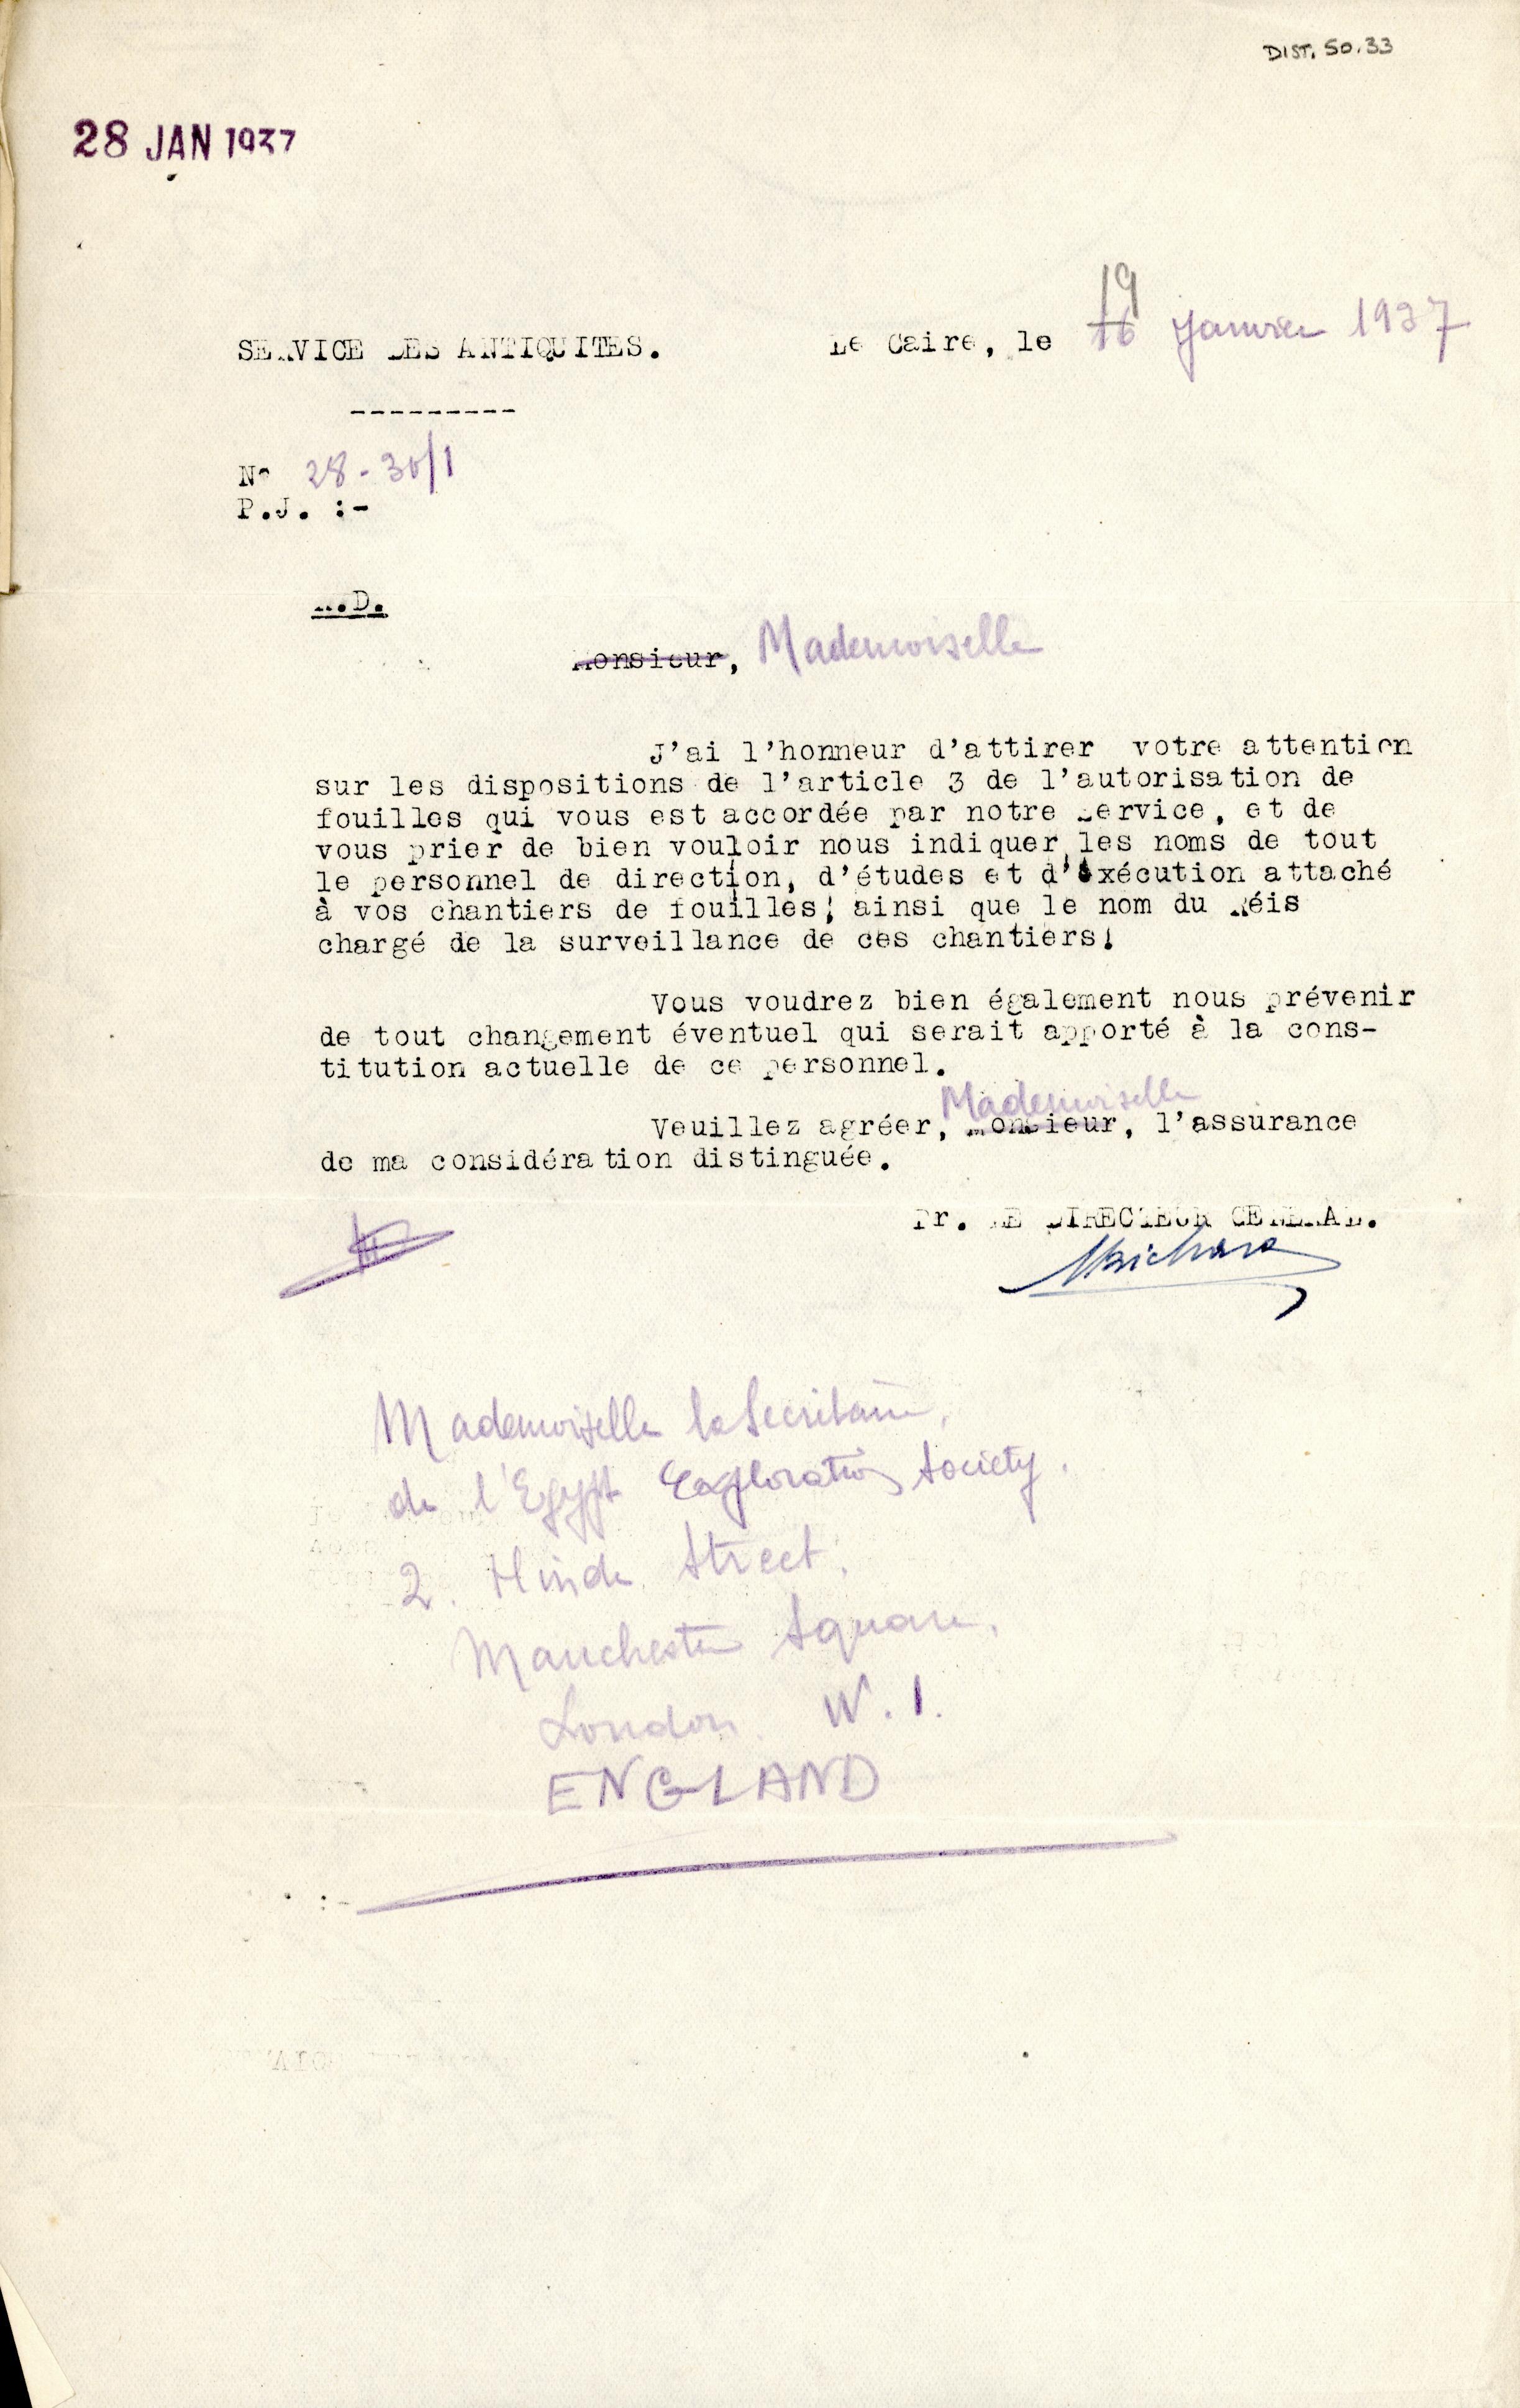 1926-39 correspondence with Antiquities Service DIST.50.33